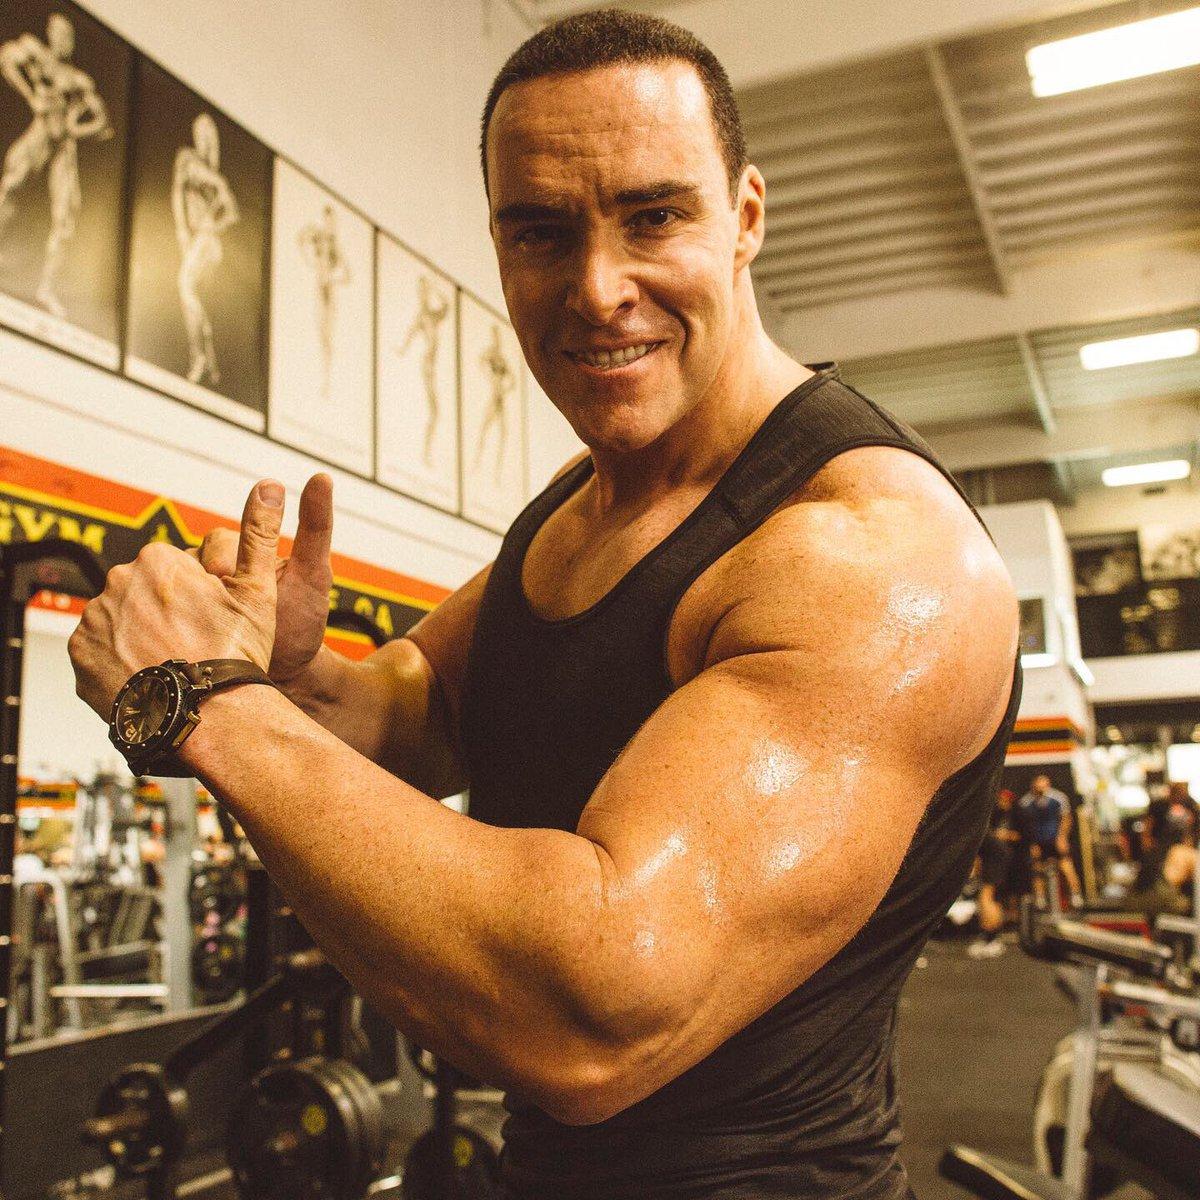 "My new fitness article ""How to get Action Hero muscles.."" is published in Budomate Magazine! 💪😊👍 https://t.co/QCXXRkJ4c9 Моя новая статья (на английском) о том, как накачать мускулы киногероя опубликована в издании Budomate! #alexandernevsky #александрневский #fitnes #фитнес https://t.co/HUh0m7zkxv"